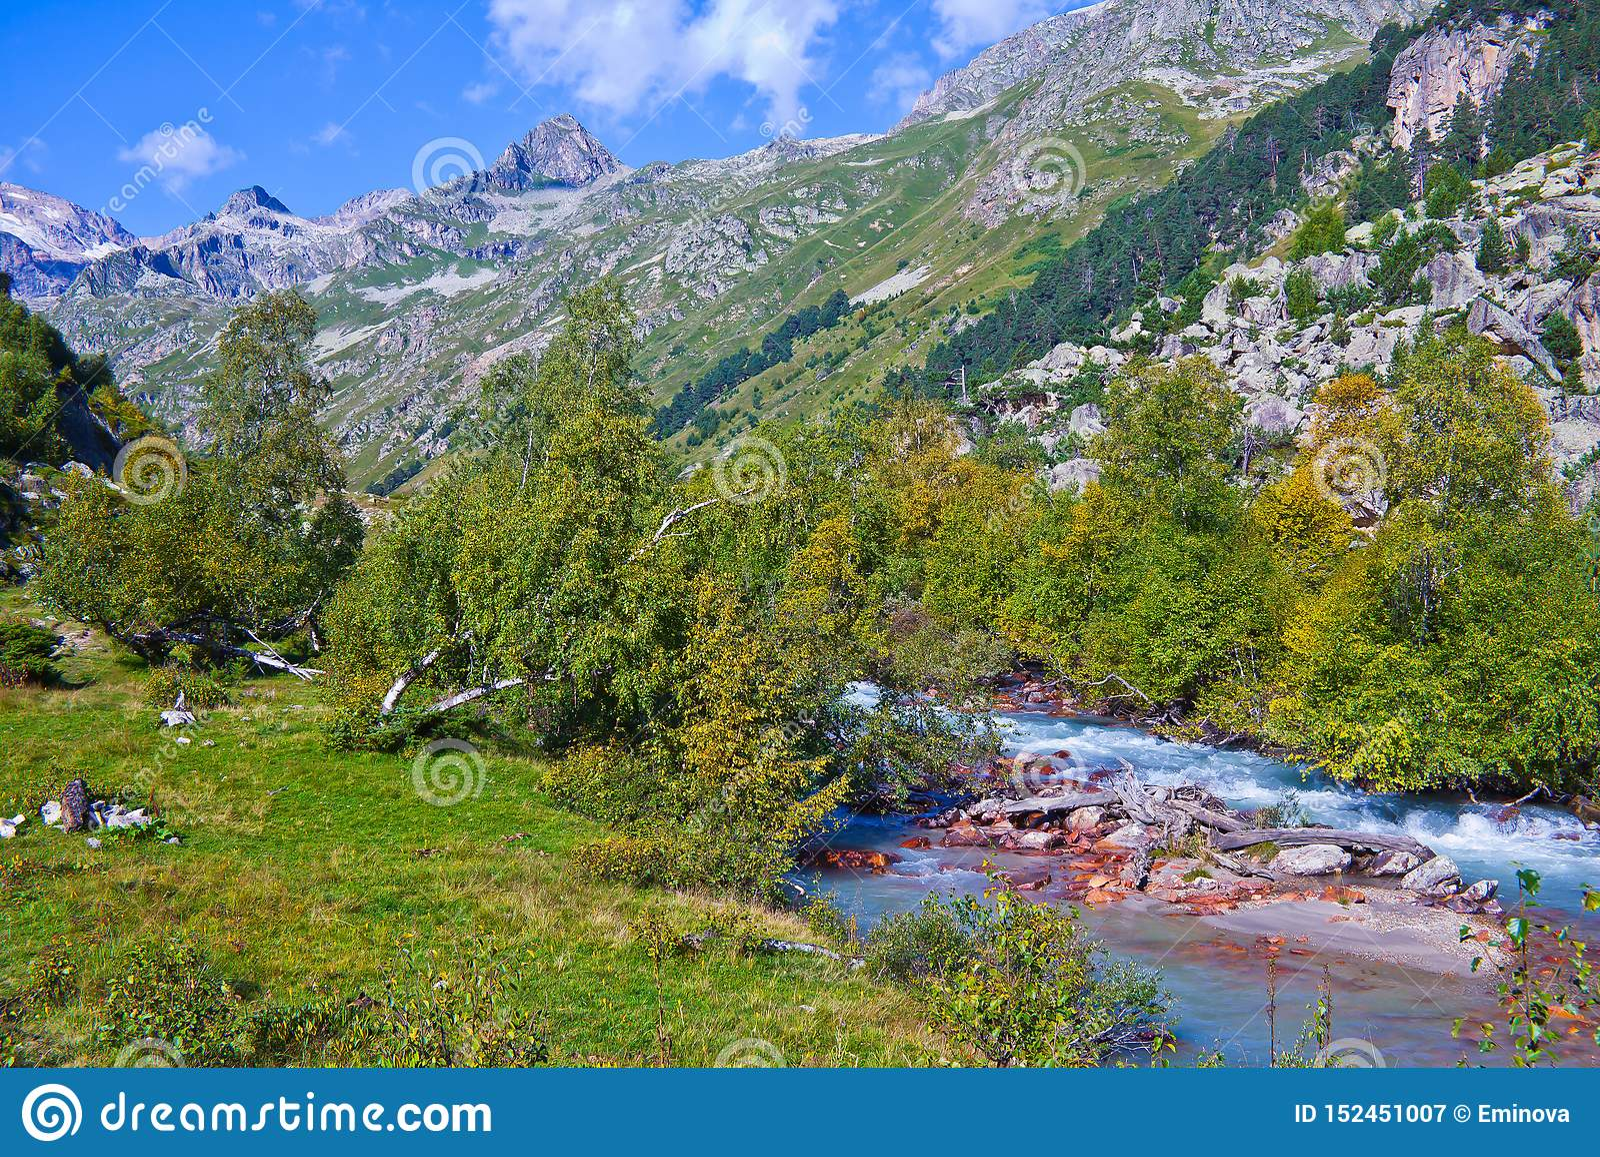 Mountain gorges of the Caucasus